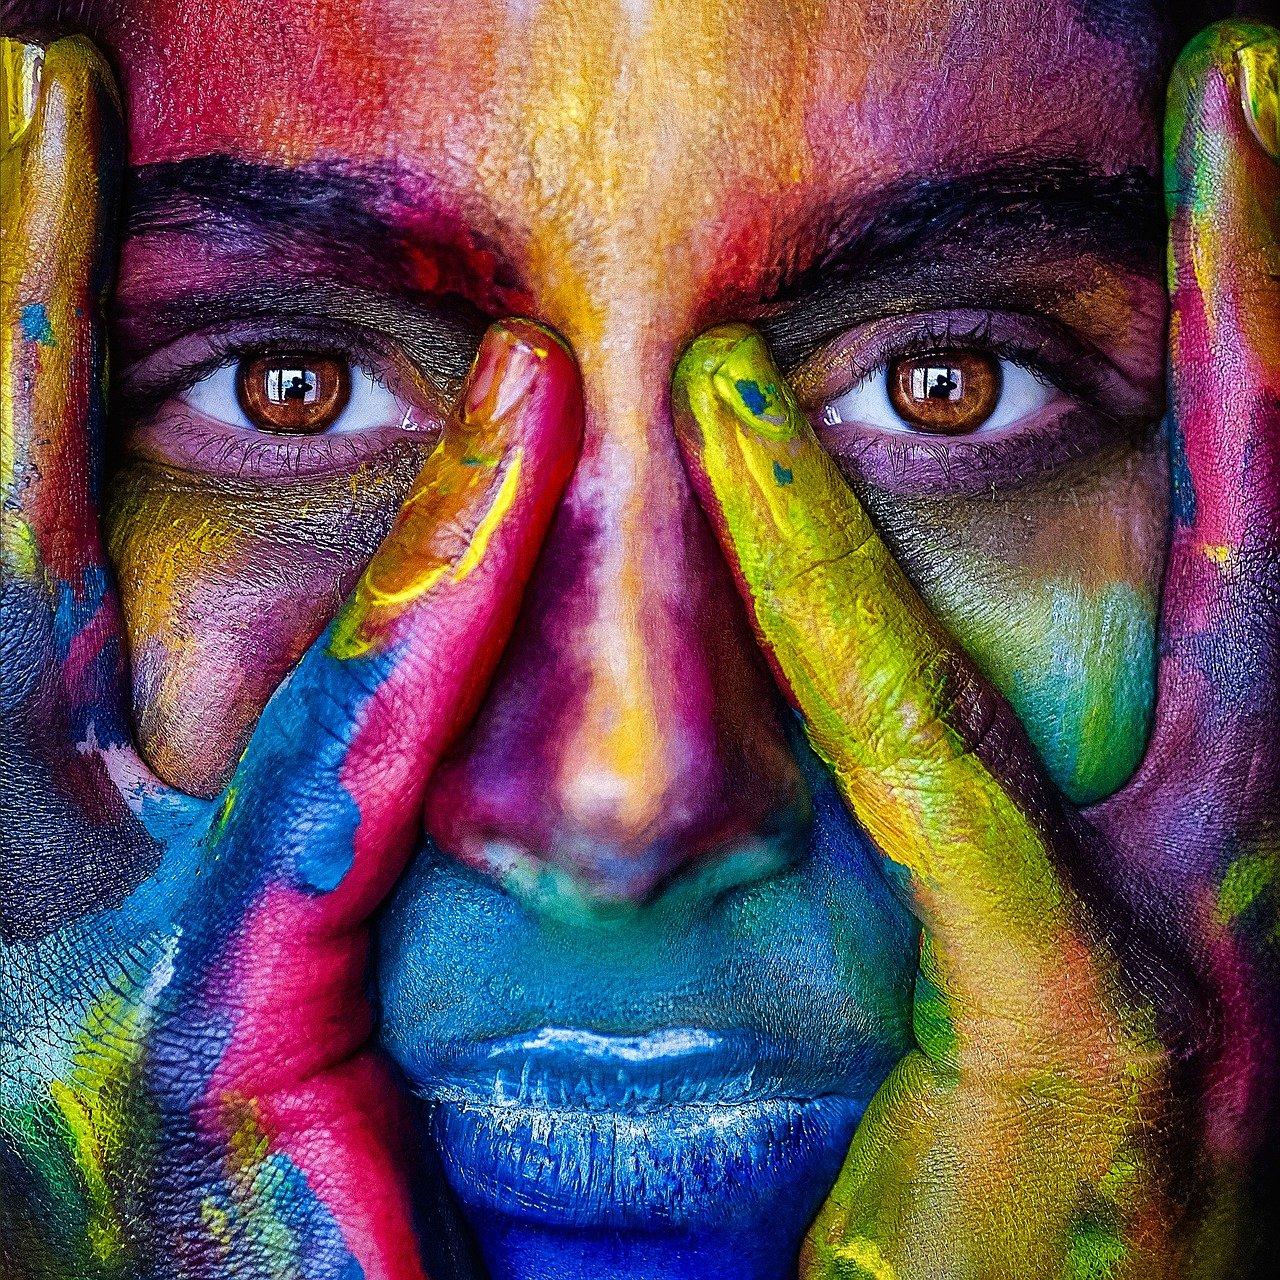 Kulturwissenschaft Abschluss Gesicht bunt Farben Multikulti